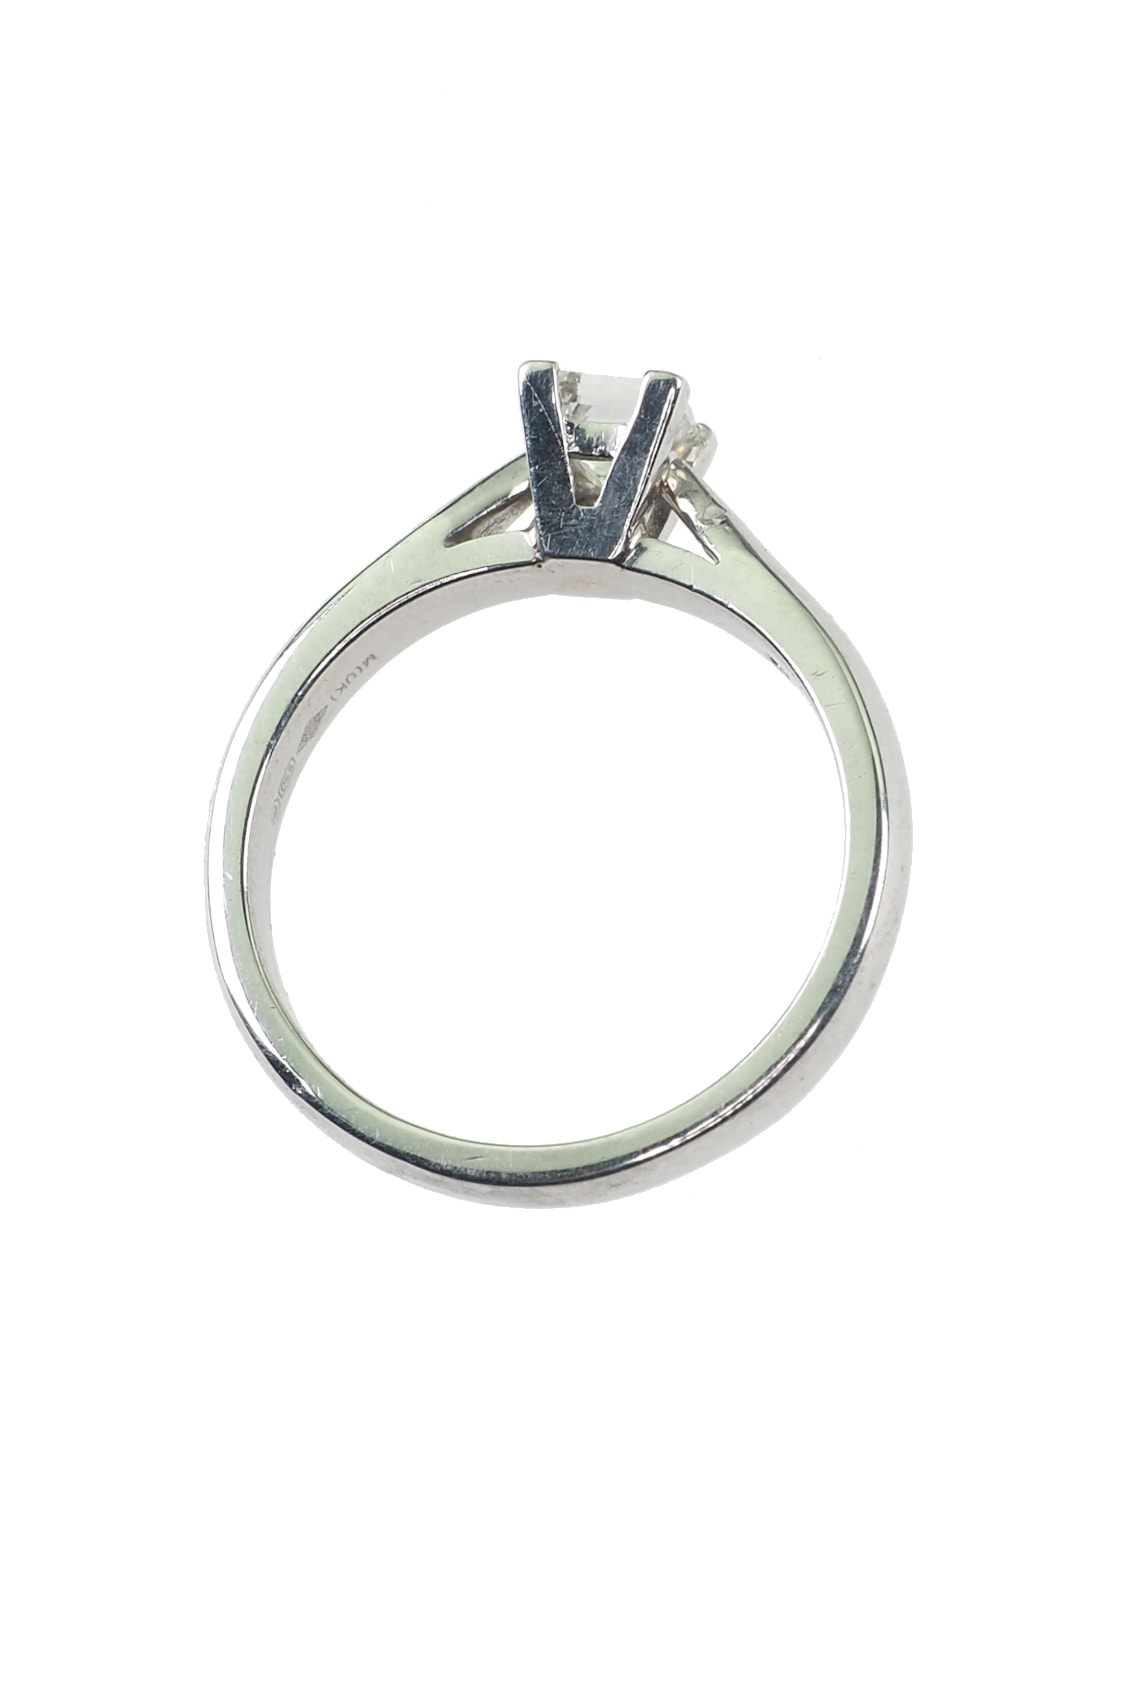 antike-Verlobungsringe-online-2692c